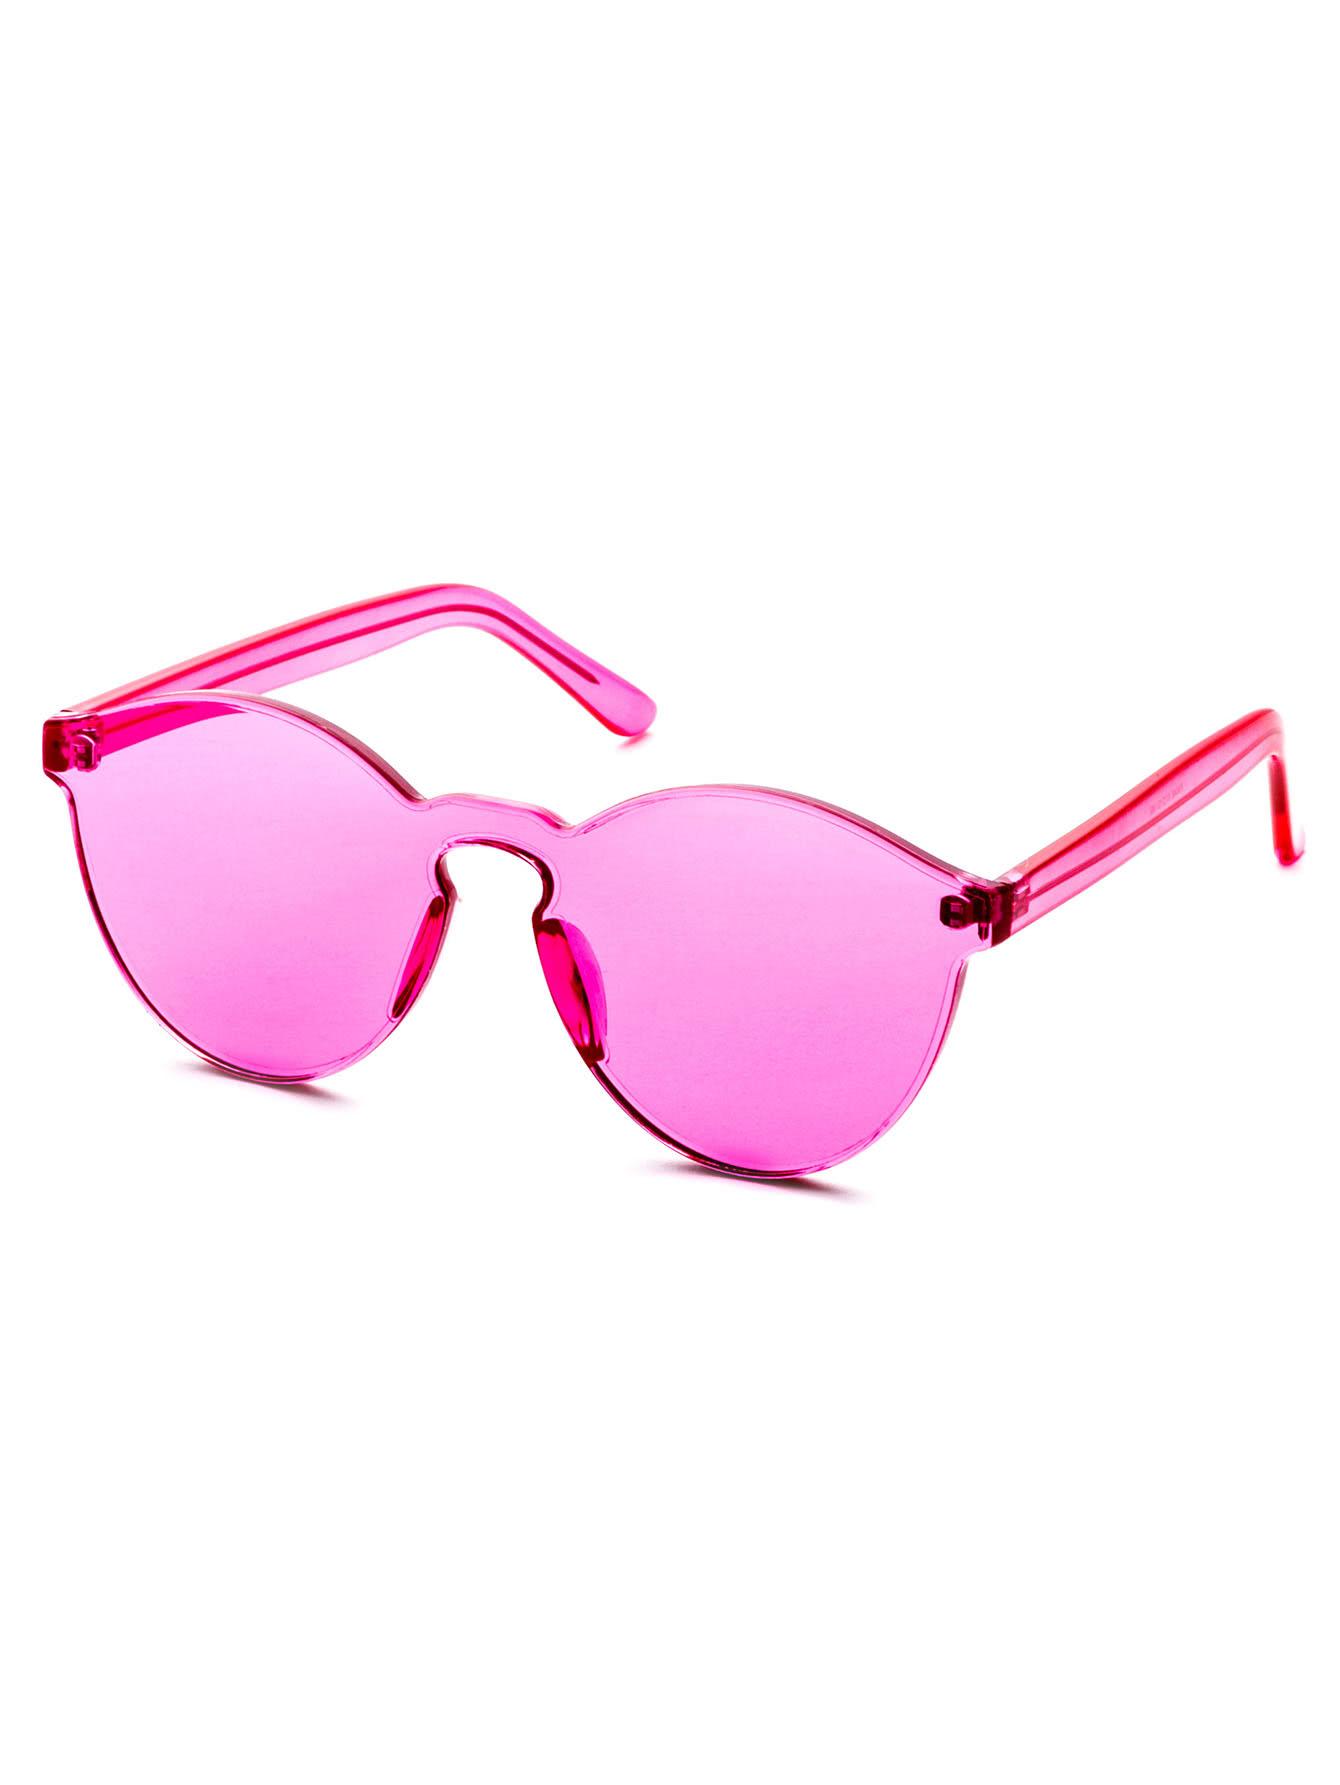 70f63bb1dcd02 Pink Retro Sunglasses - Alex Malay